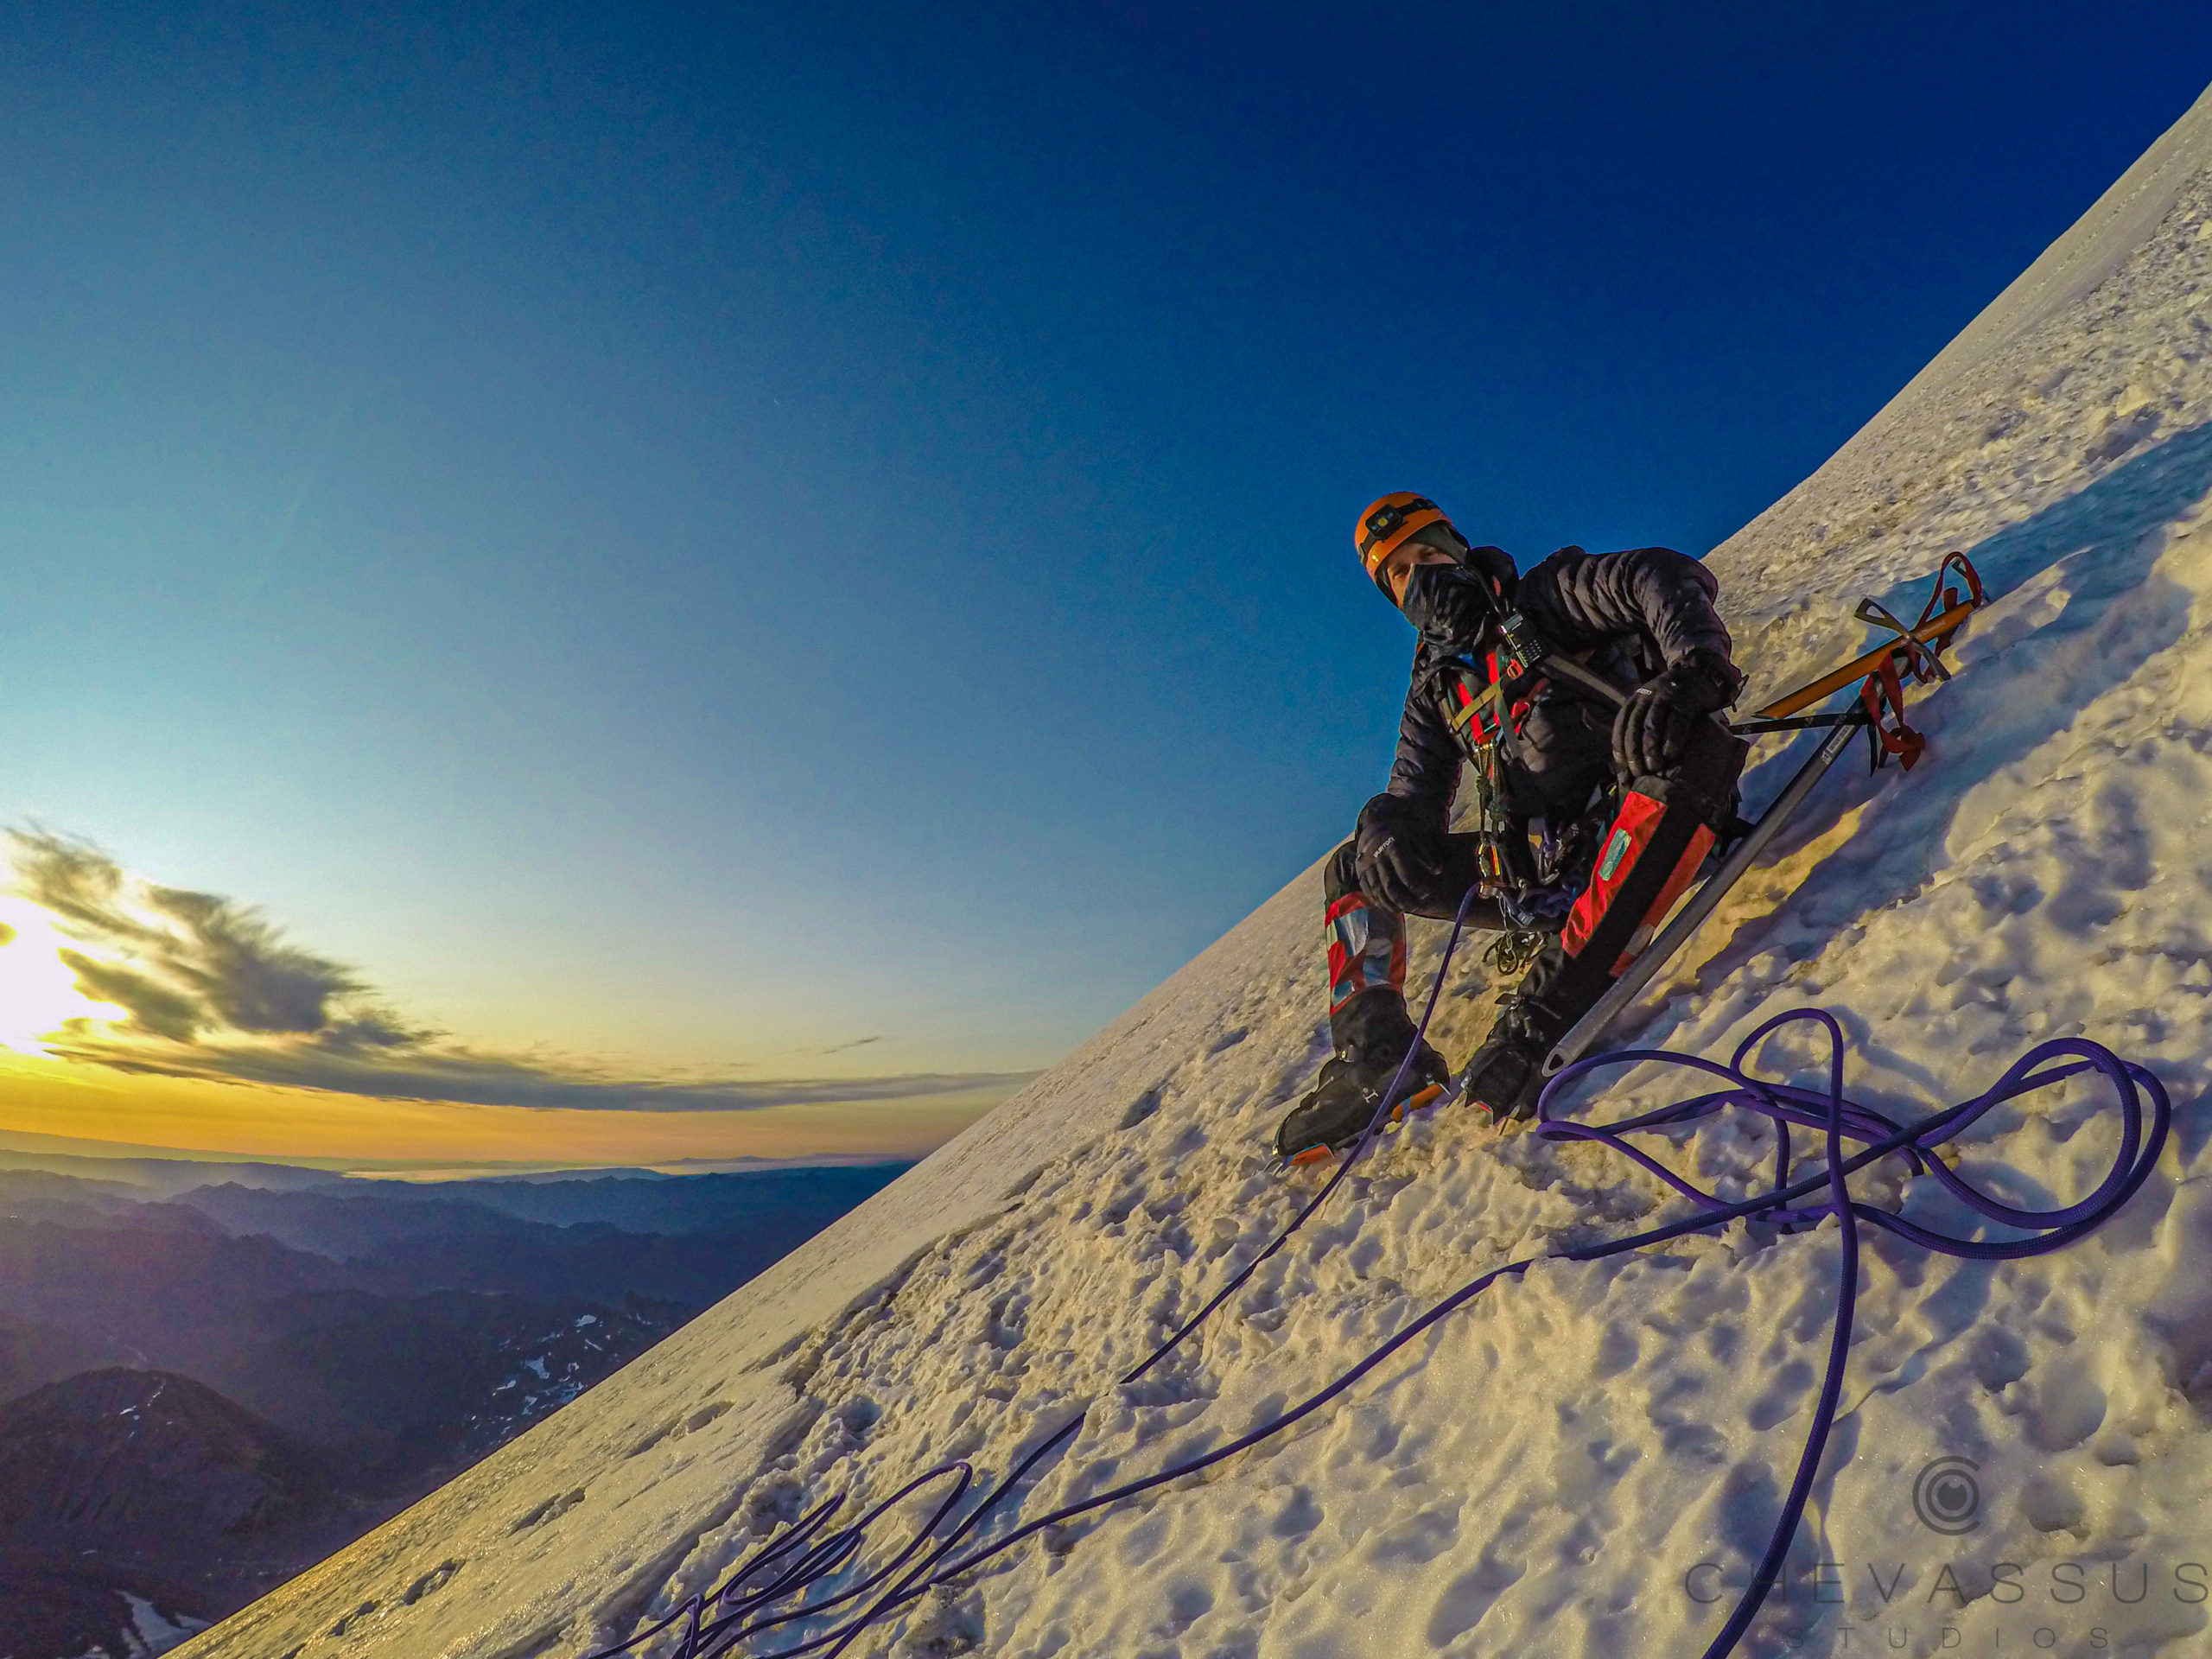 Brian Hiller climbing Mt Rainier